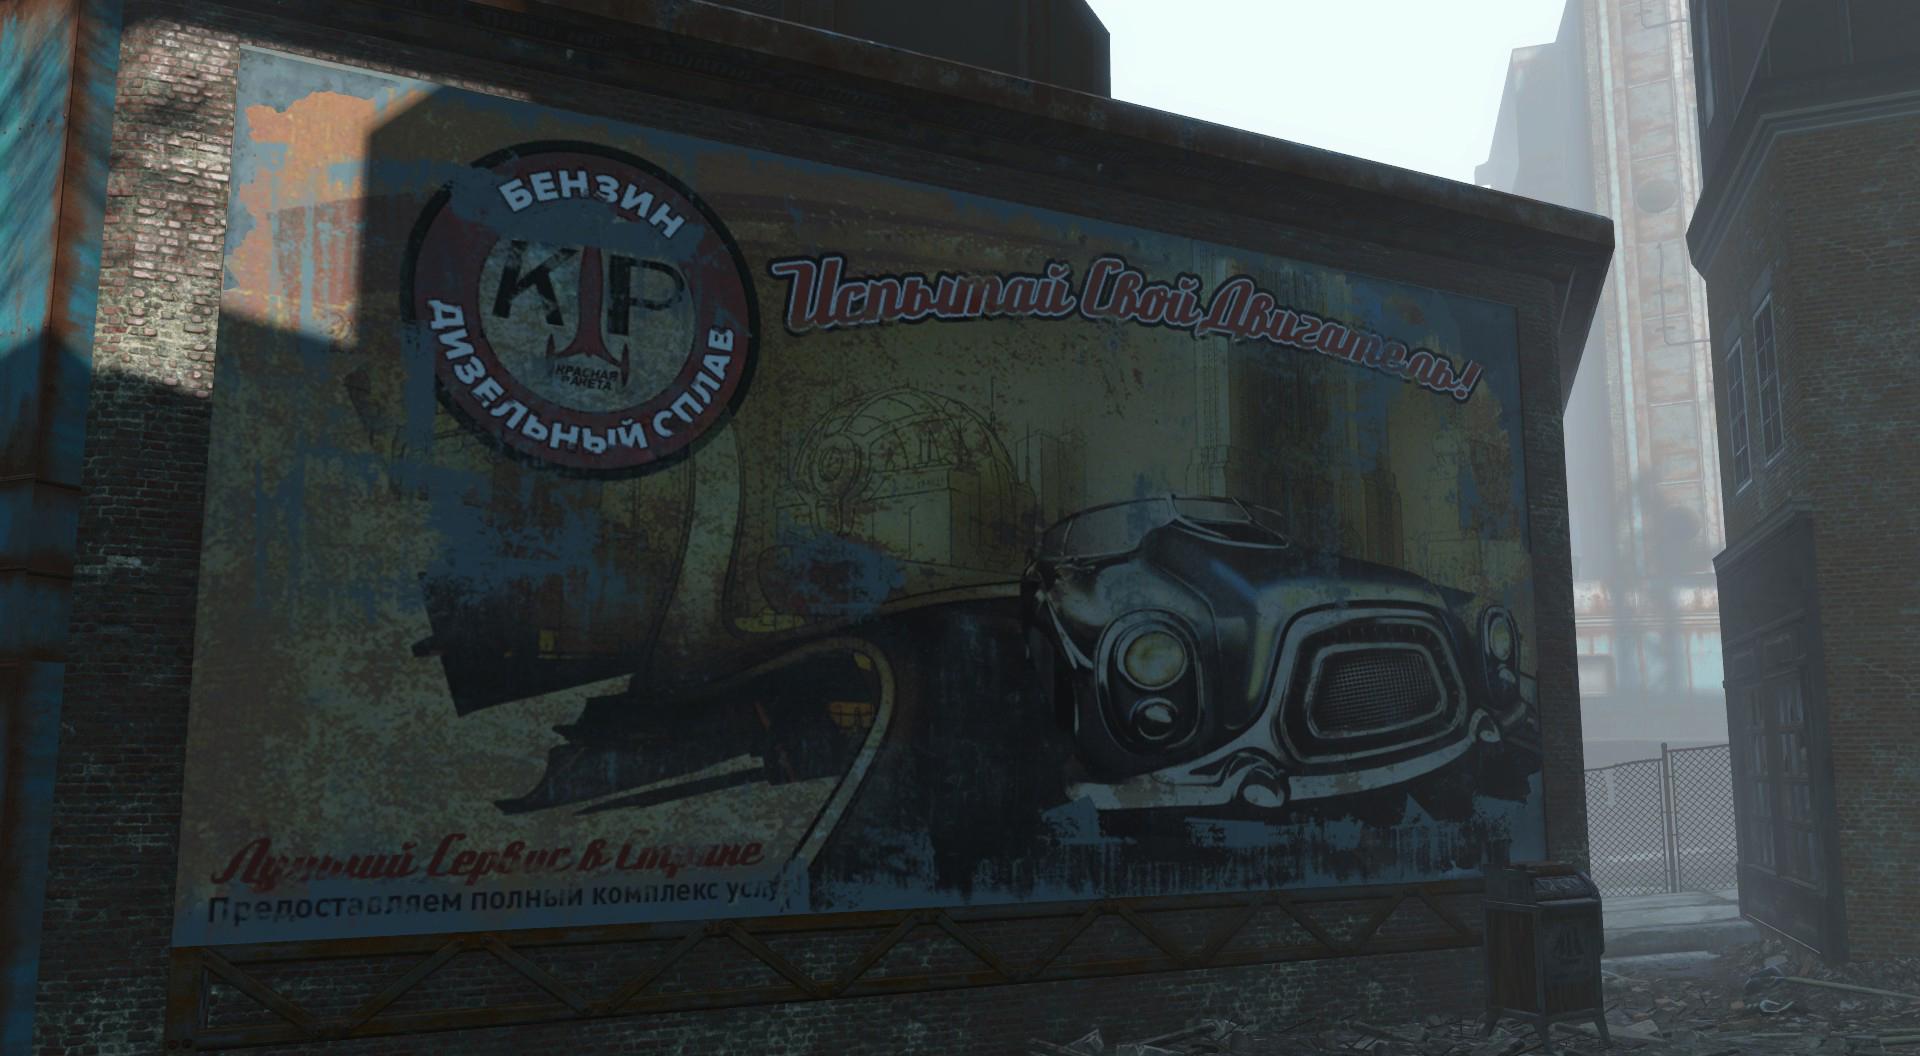 Мелочь от Hiro - Fallout 4 Мелочь от Hiro Локализация текстур